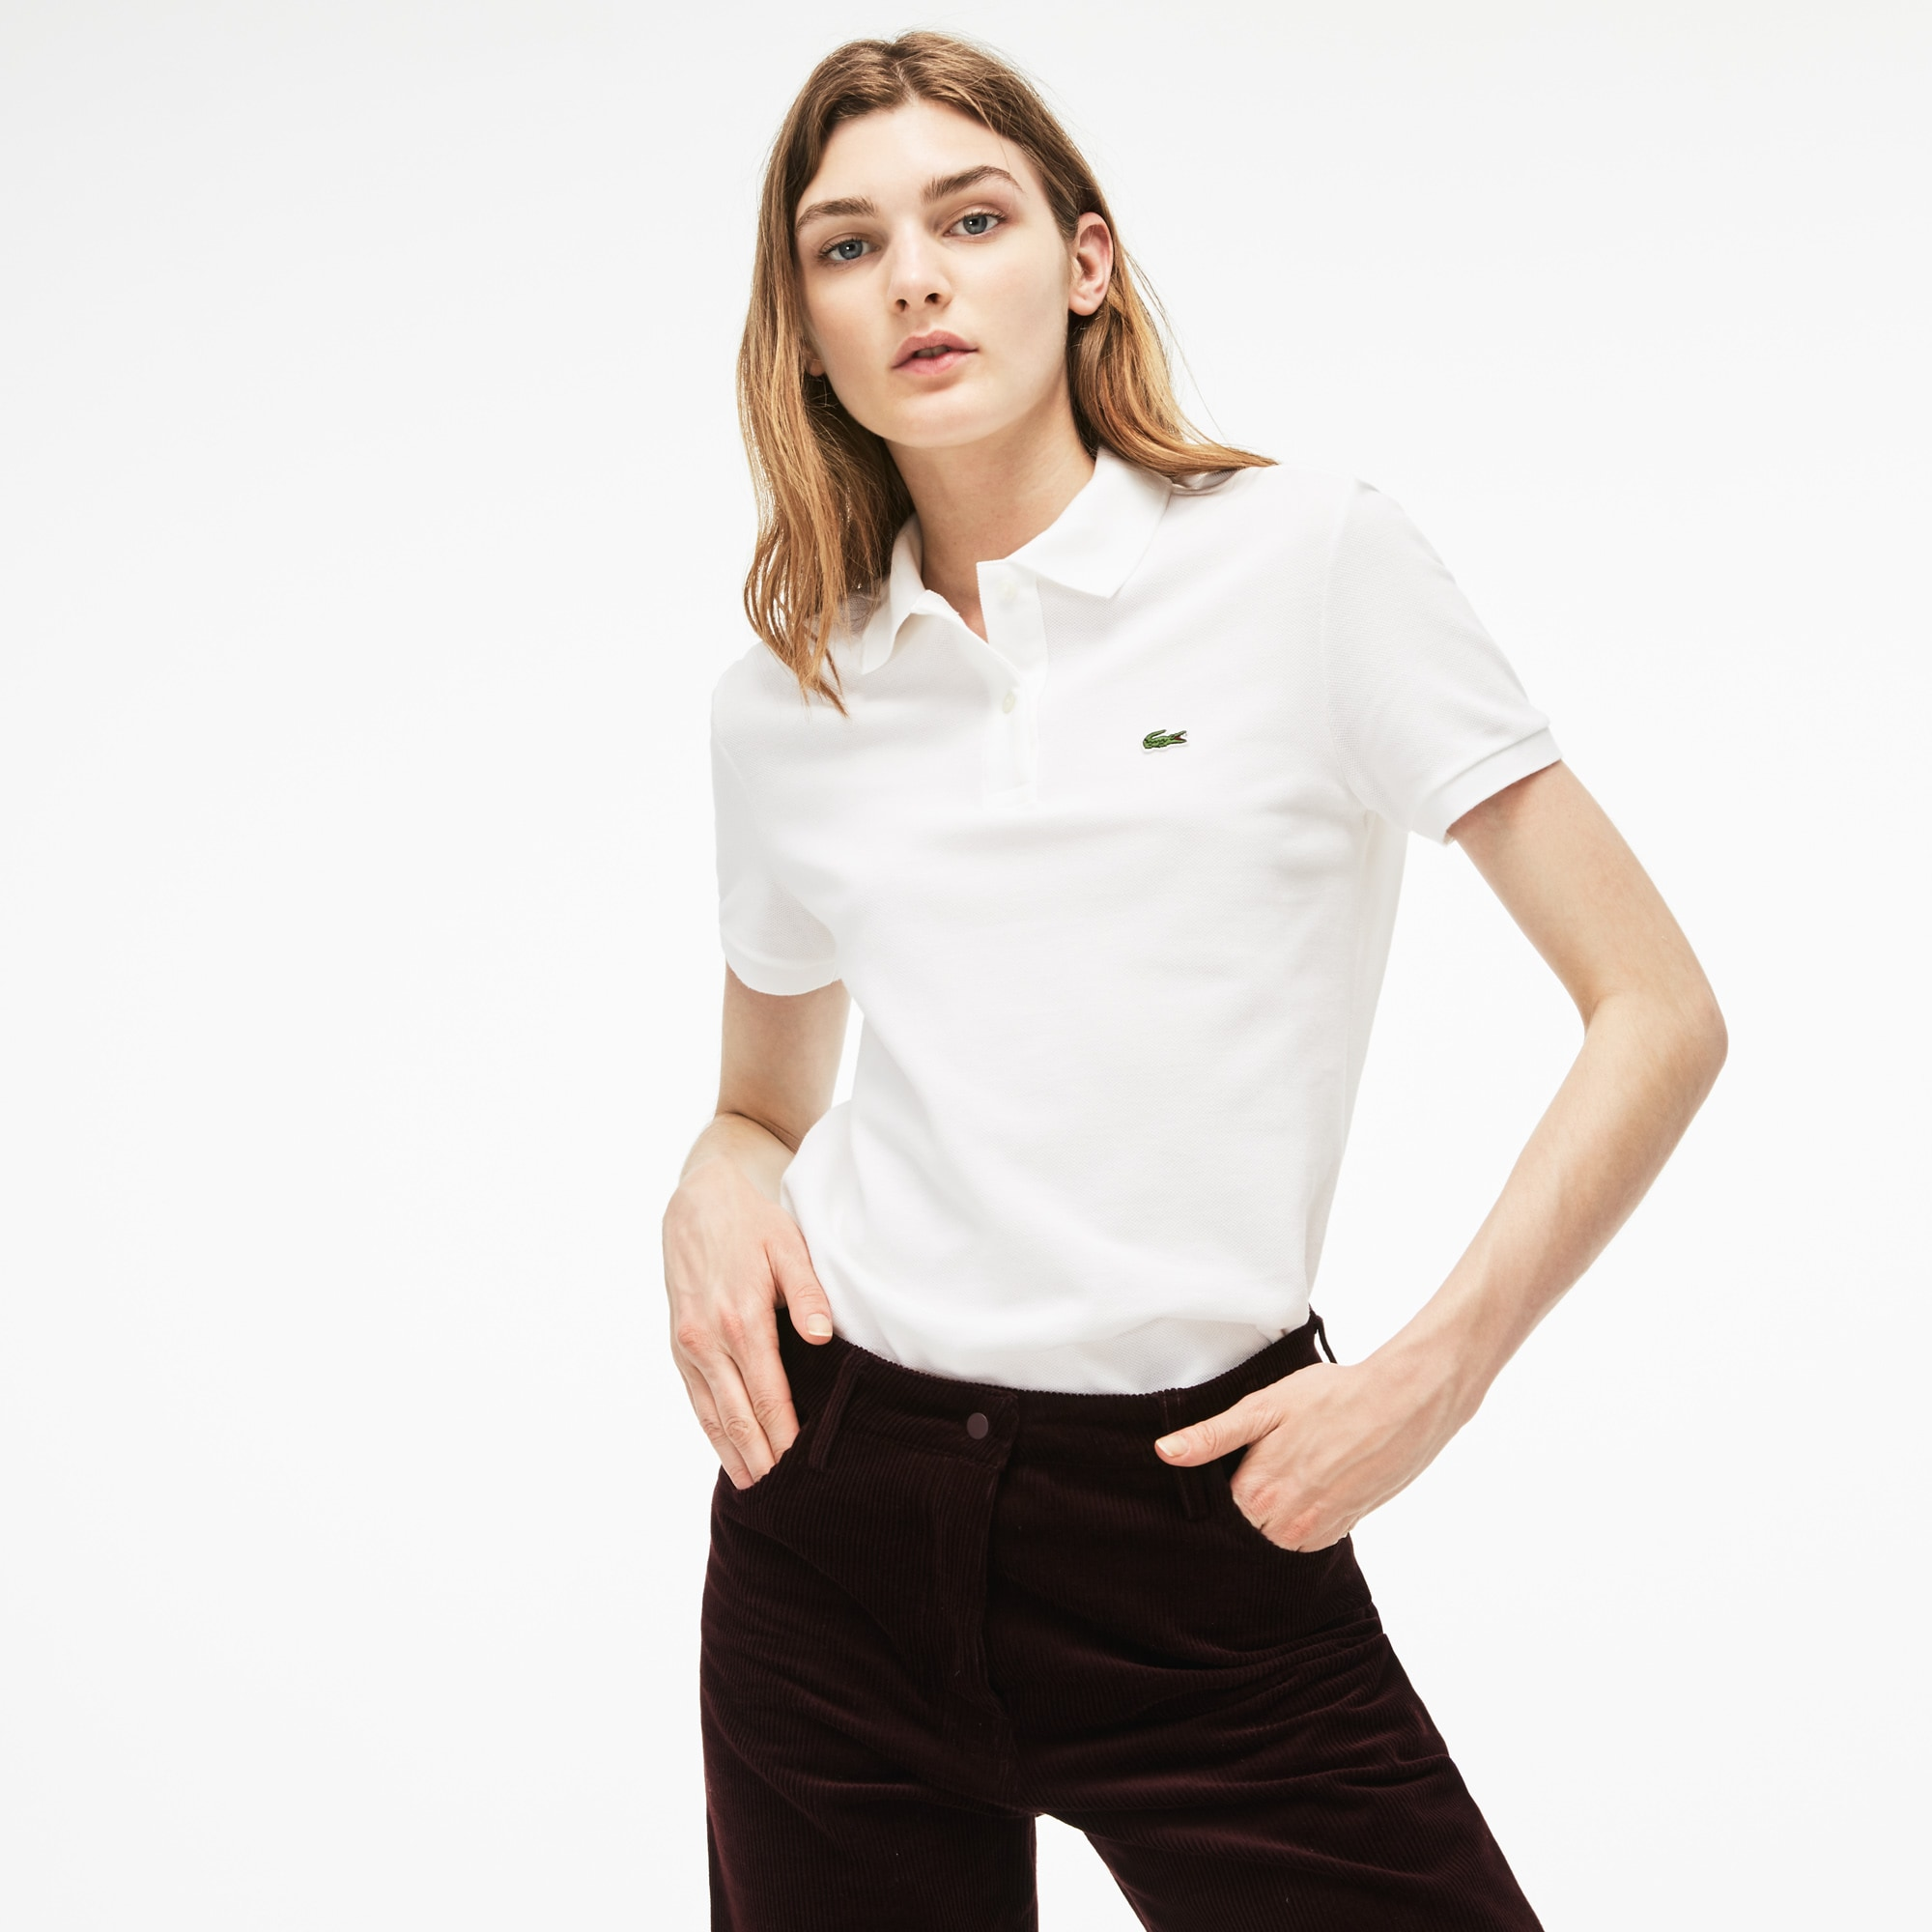 lacoste ladies polo shirts uk Cheaper Than Retail Price> Buy ...